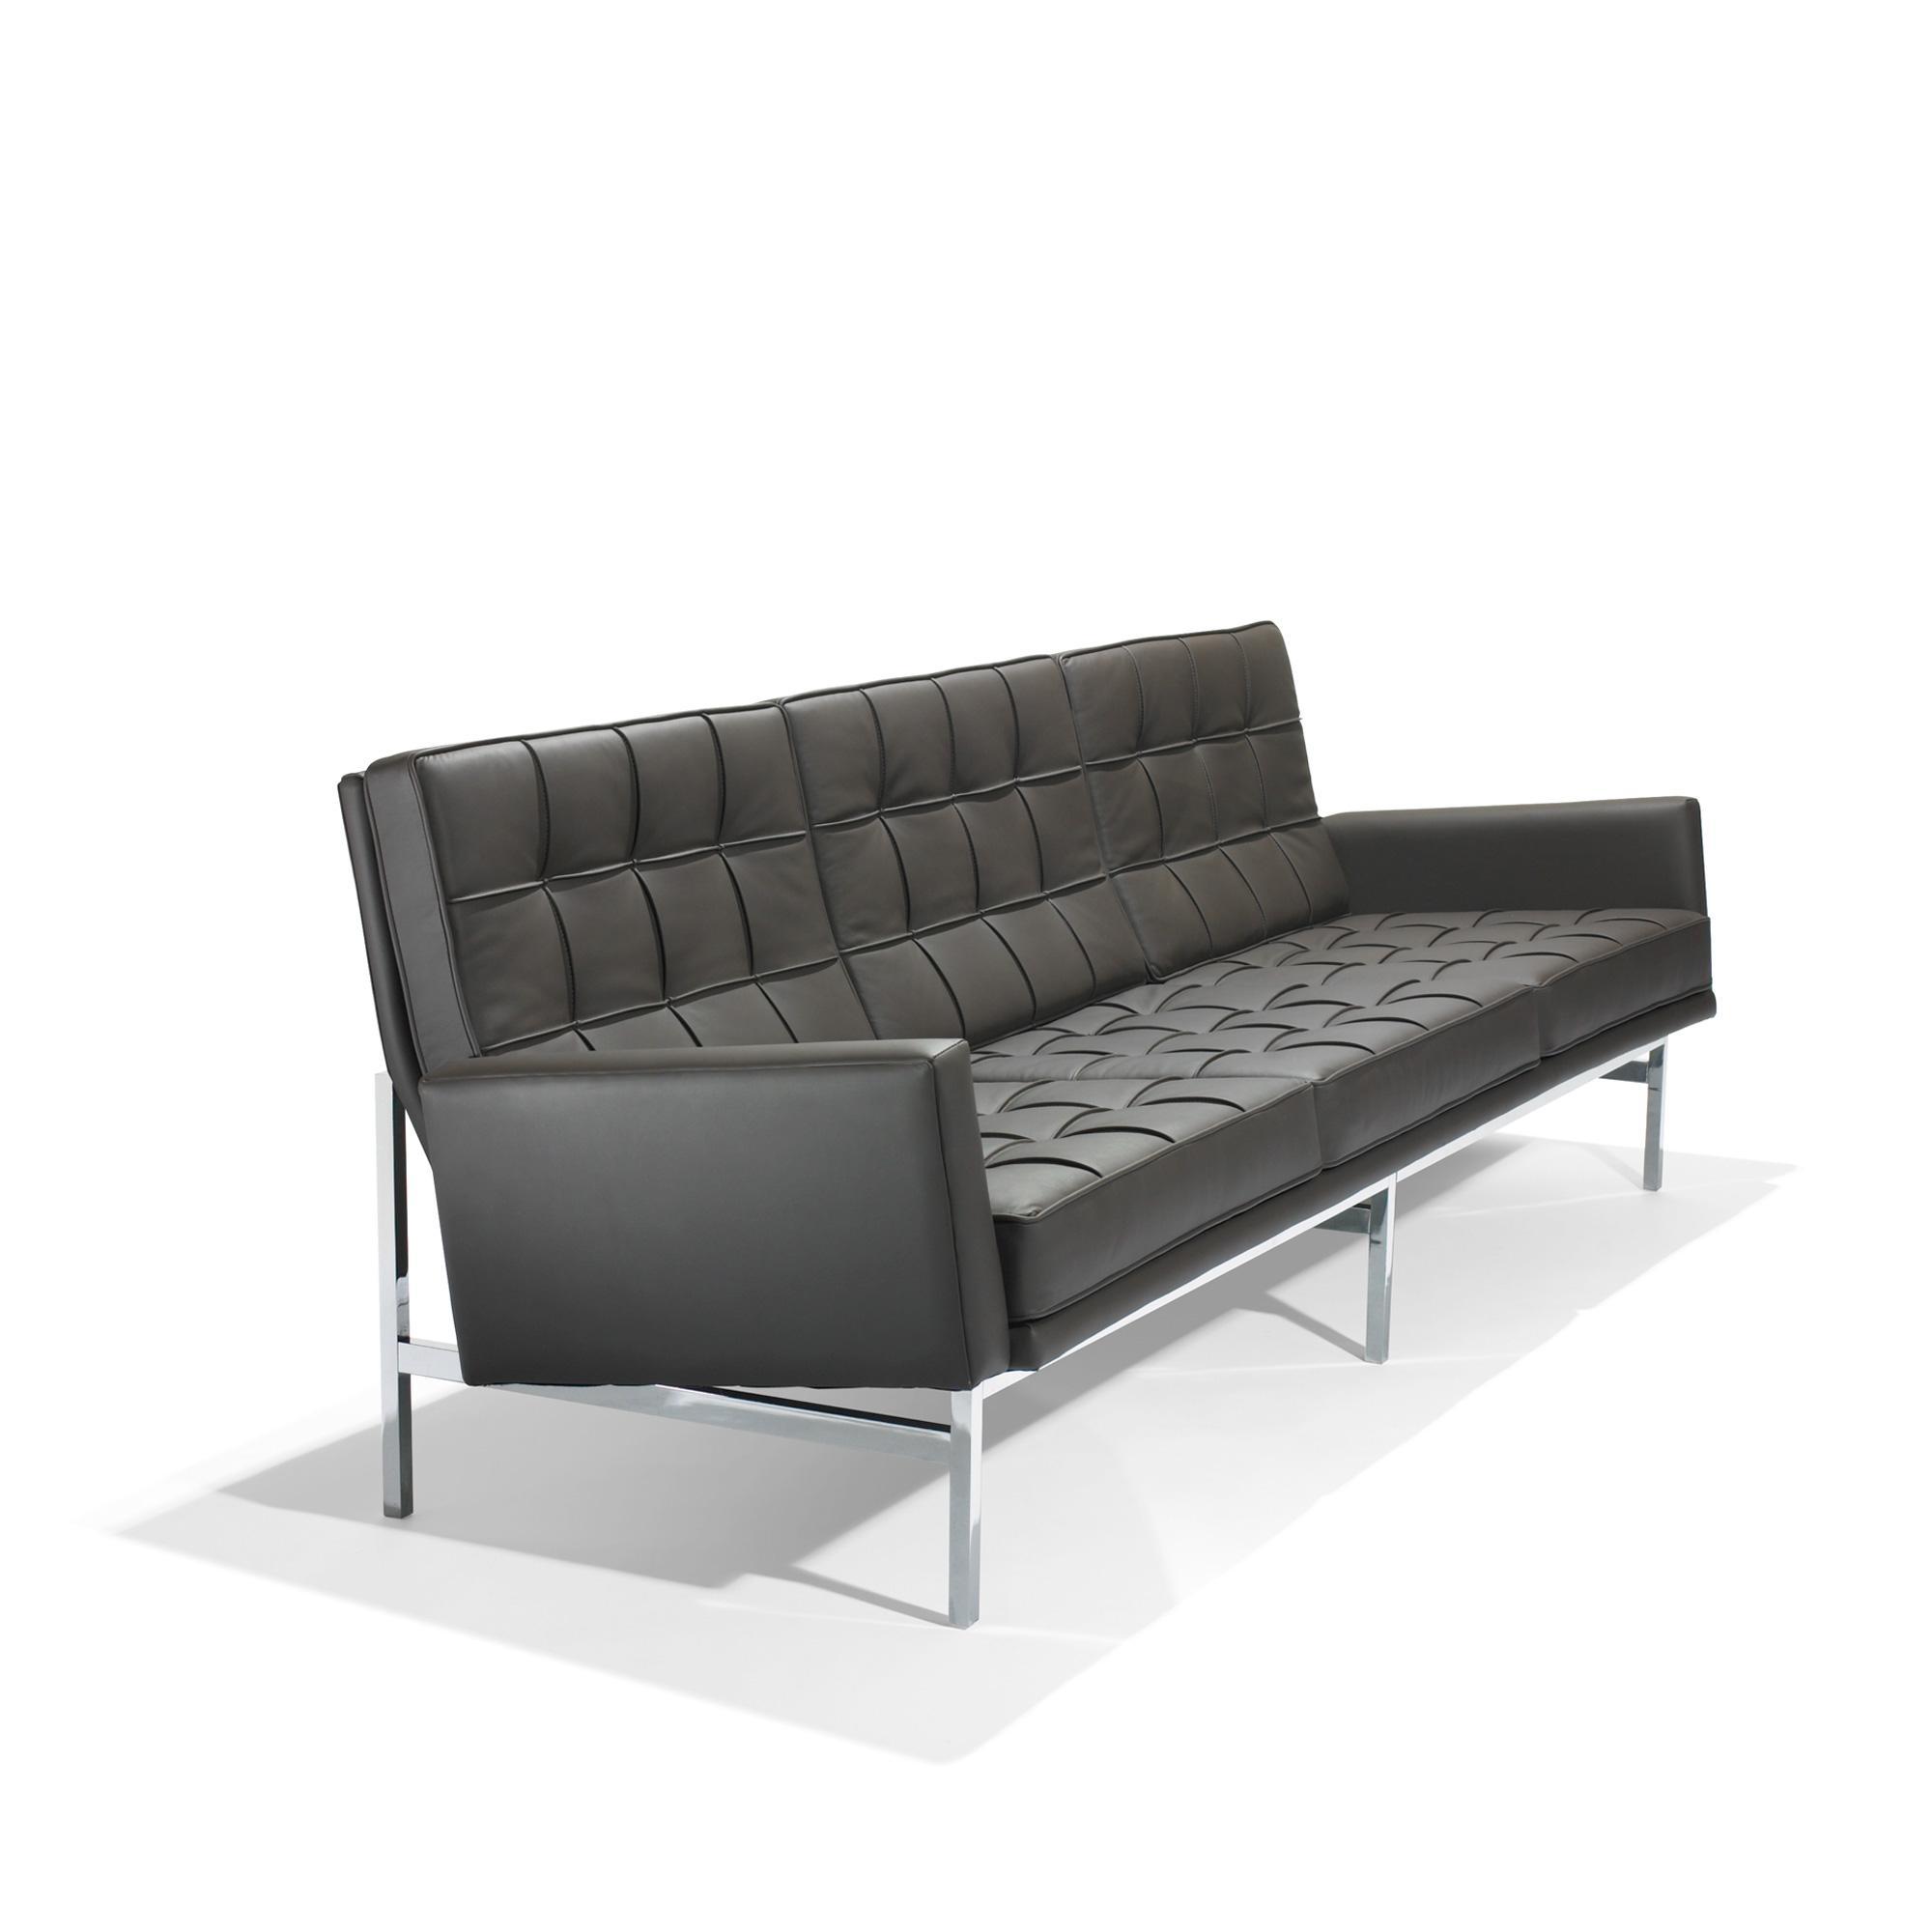 Florence Knoll sofa model 2577